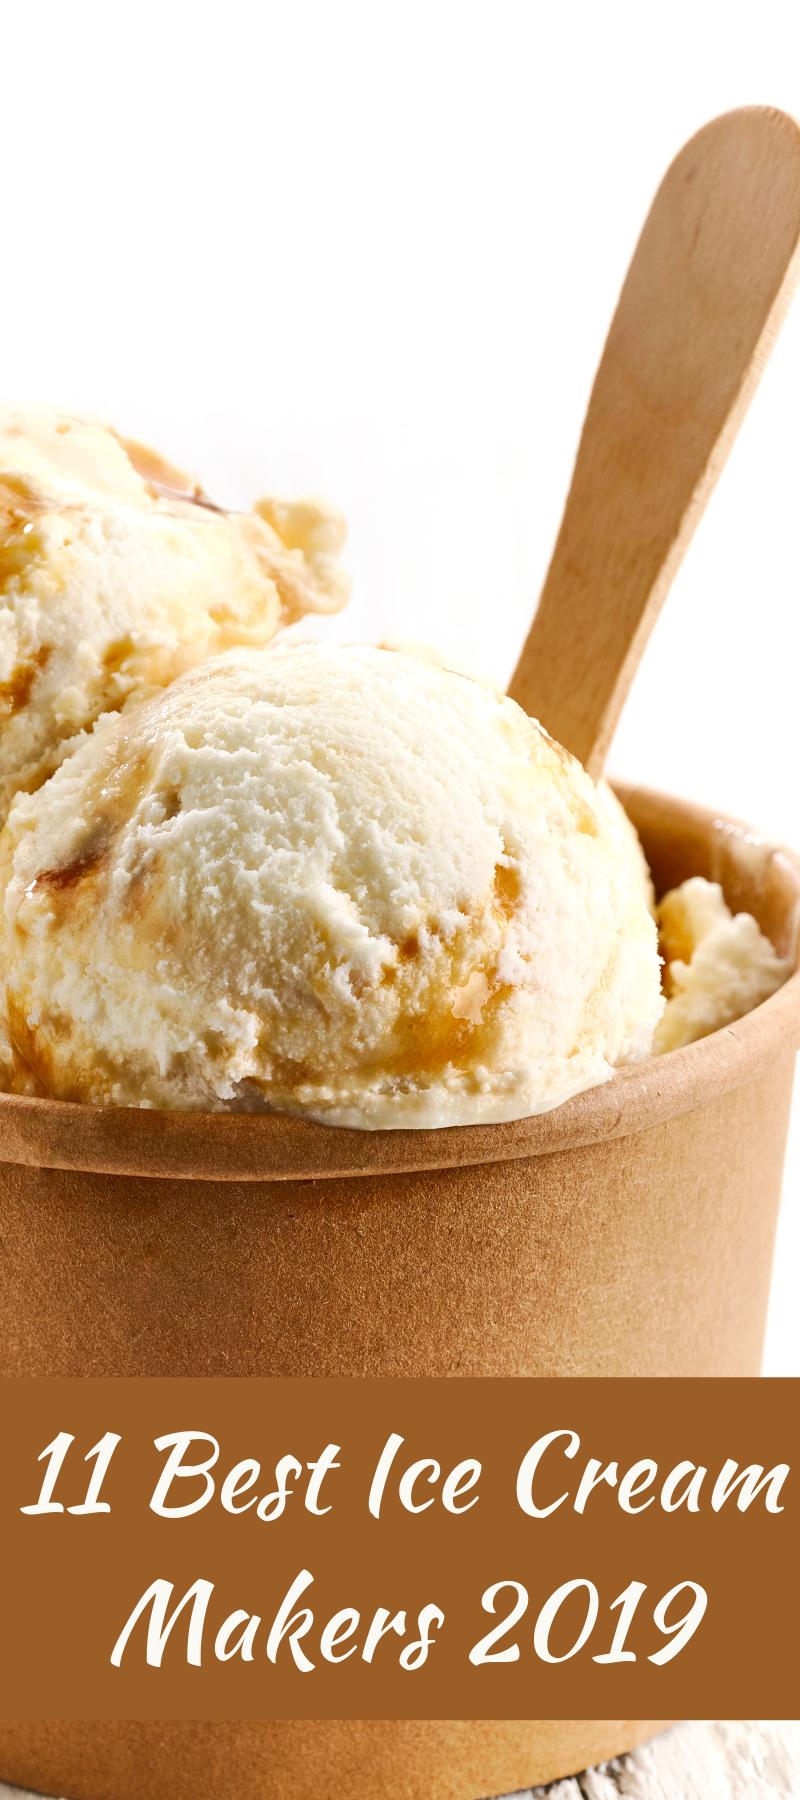 11 Best Ice Cream Makers of 2019 #icecreammaker